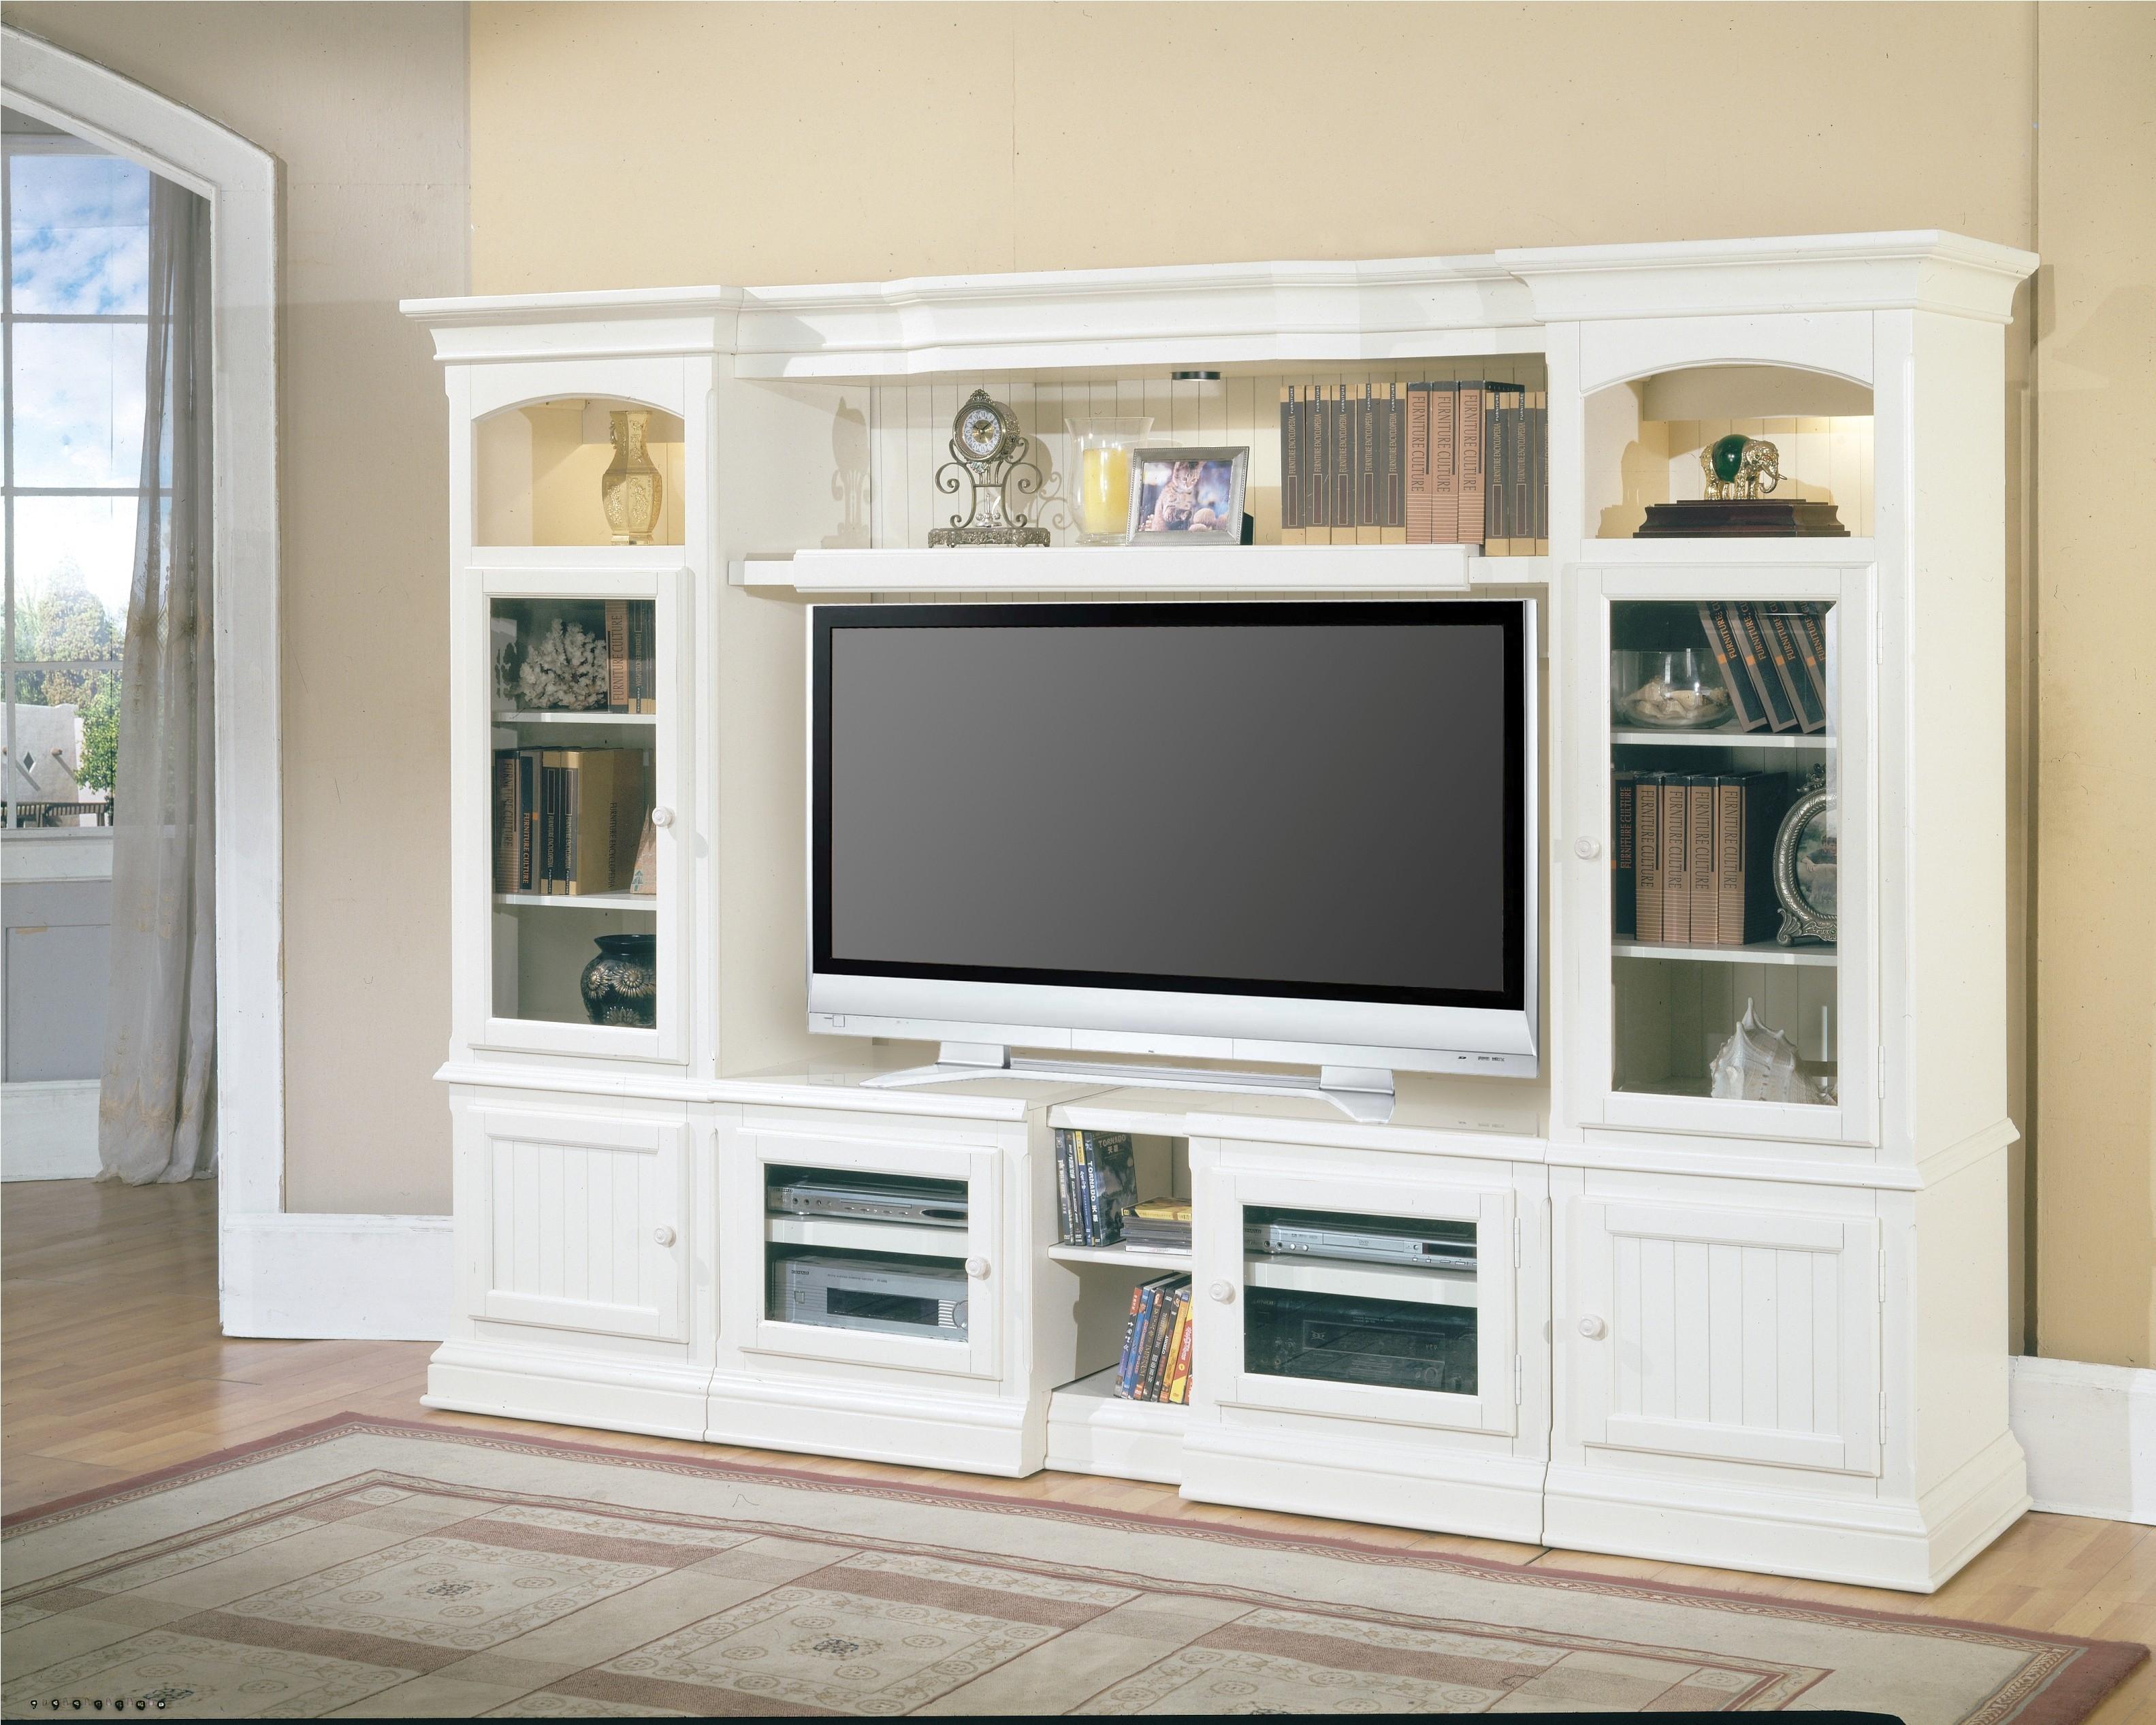 Furniture Superb Tv Cabinet Bookcase Furniture Interior Rustic For Tv Book Case (View 12 of 14)